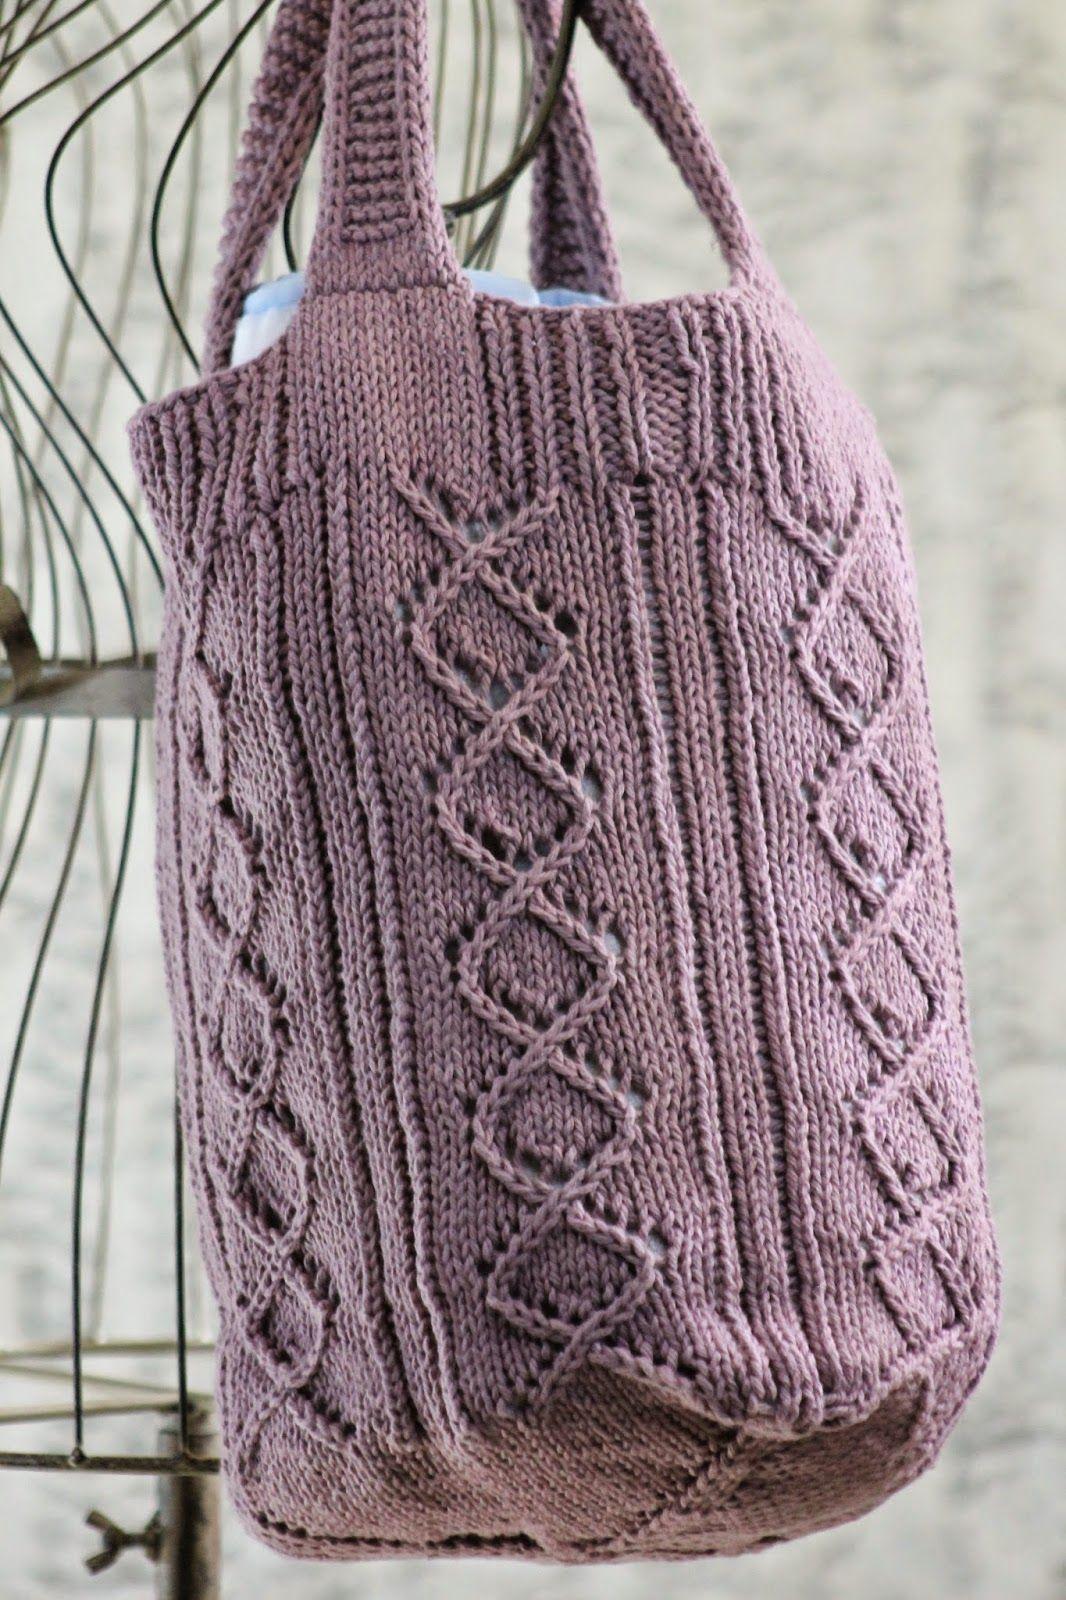 Rose Briar Bag | Bags | Pinterest | Knitting patterns, Bag and ...